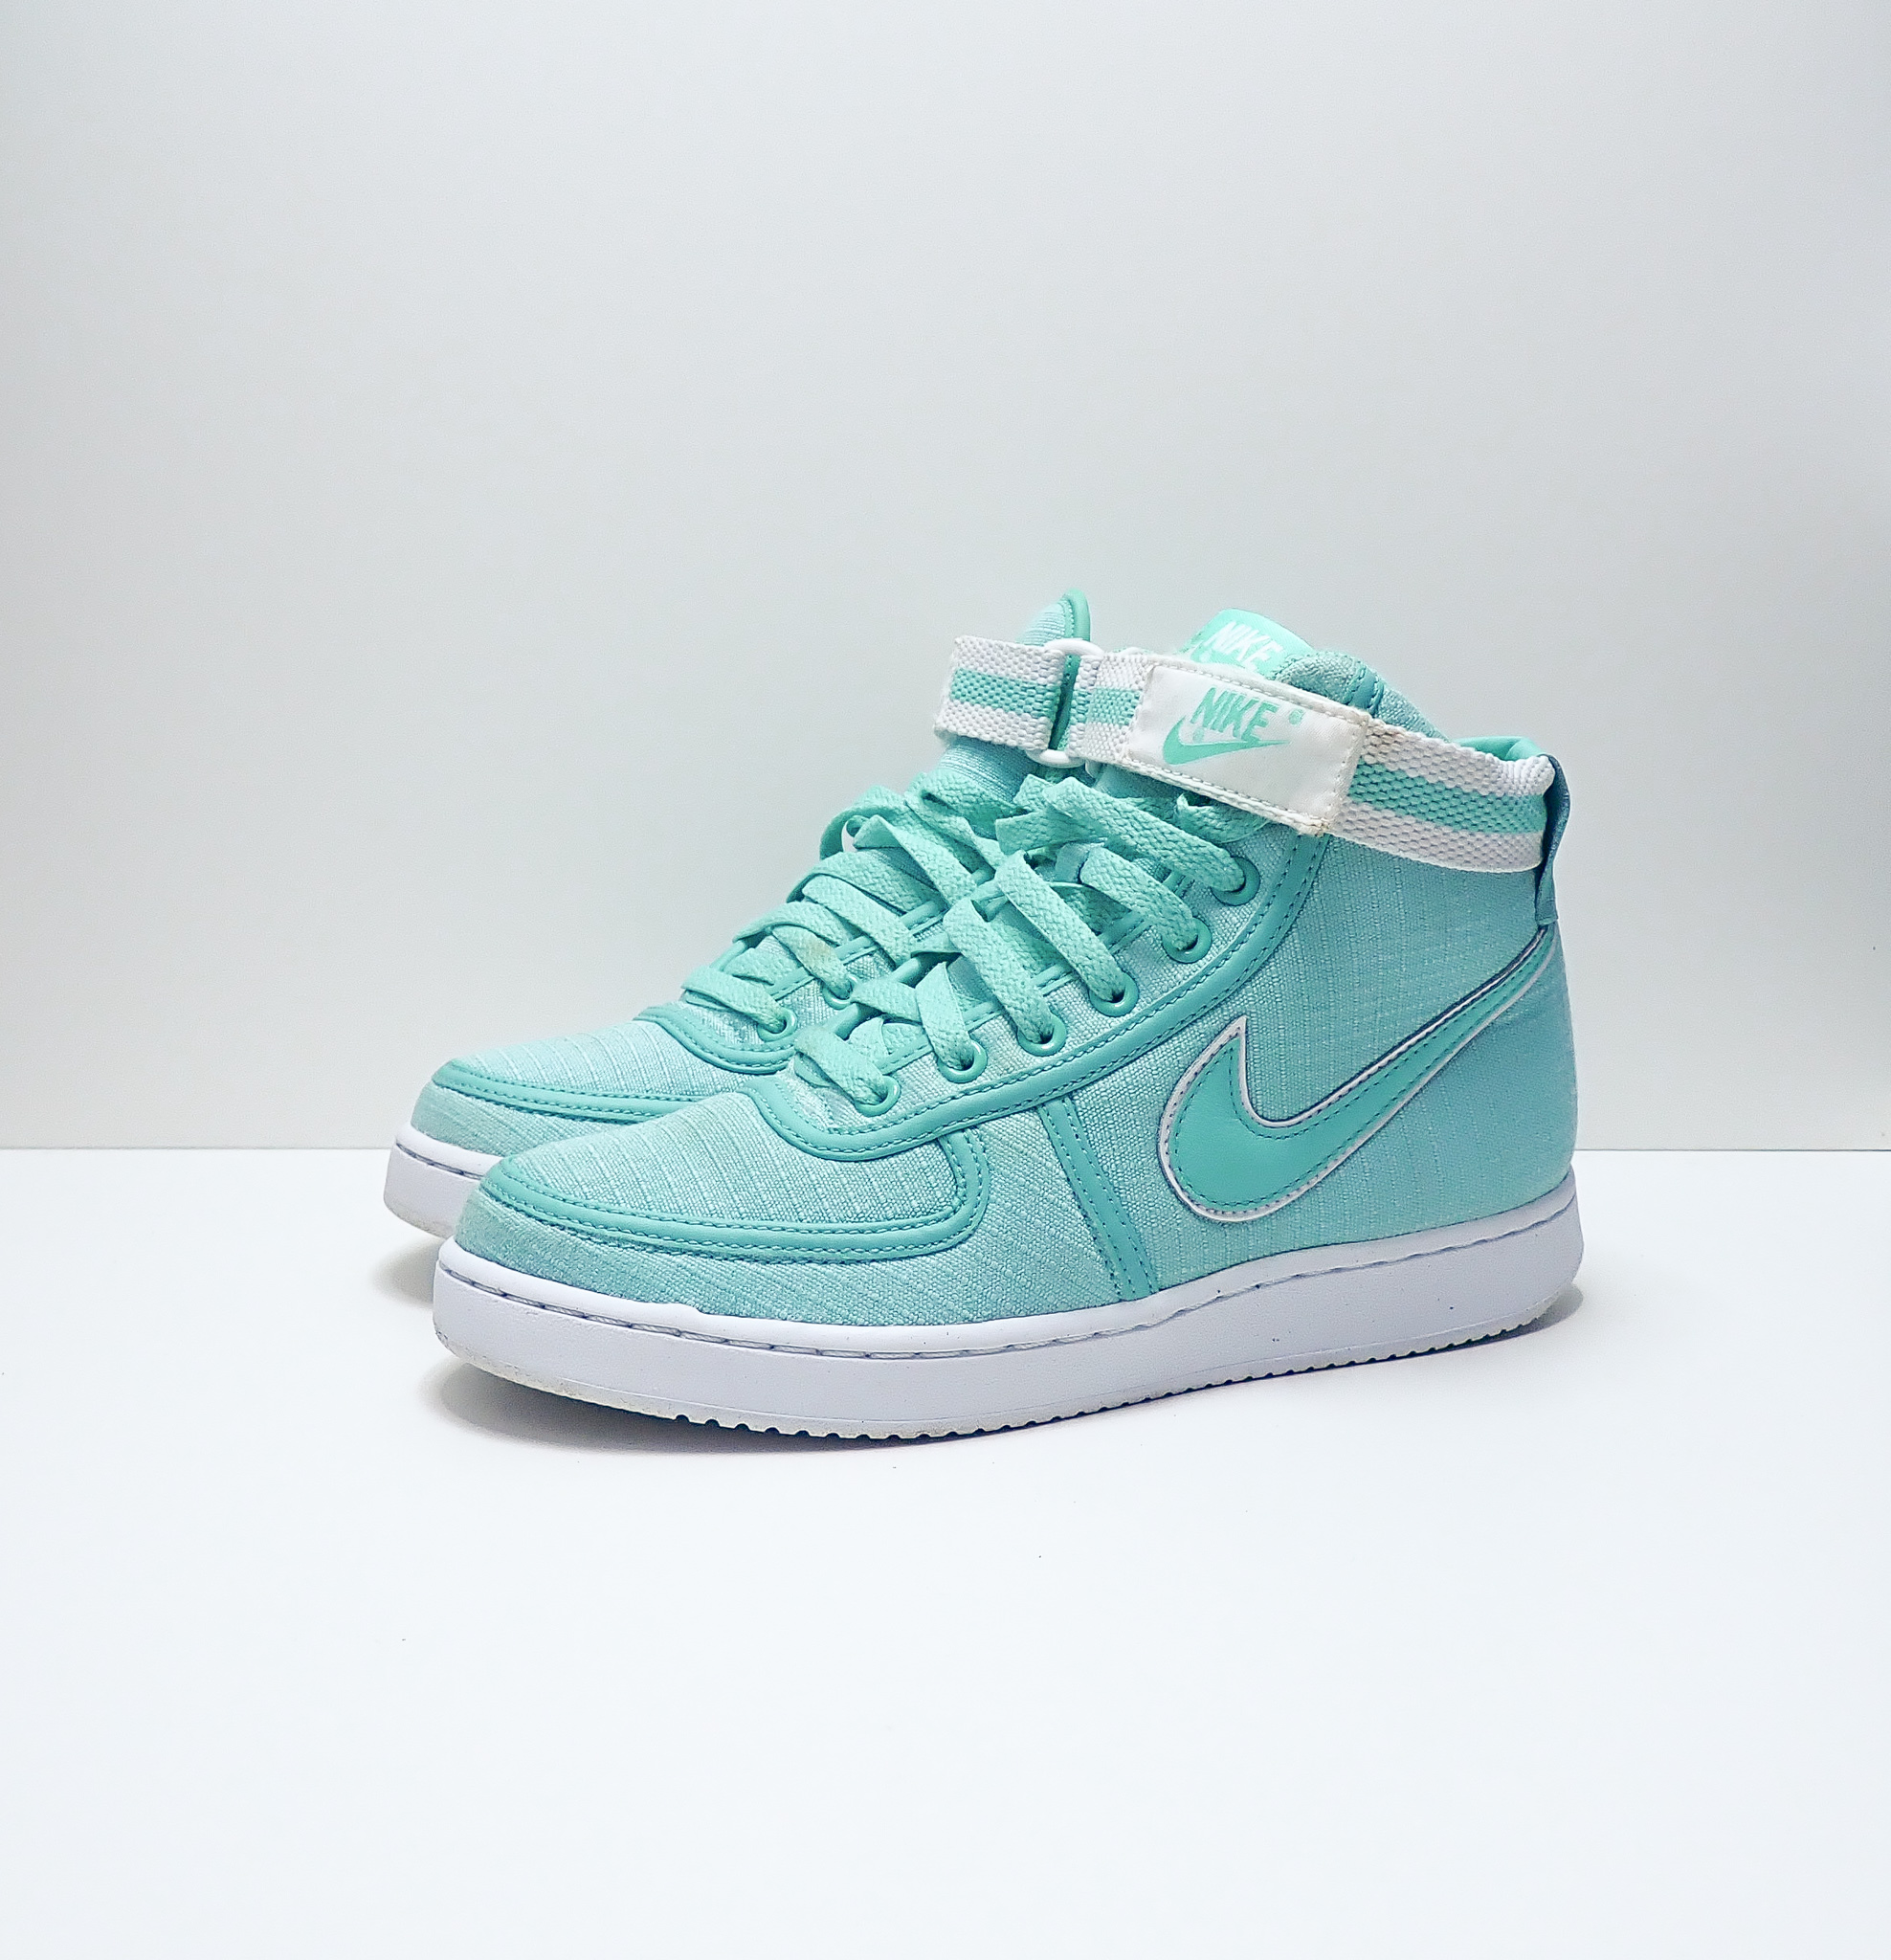 Nike Women's Vandal High Premium